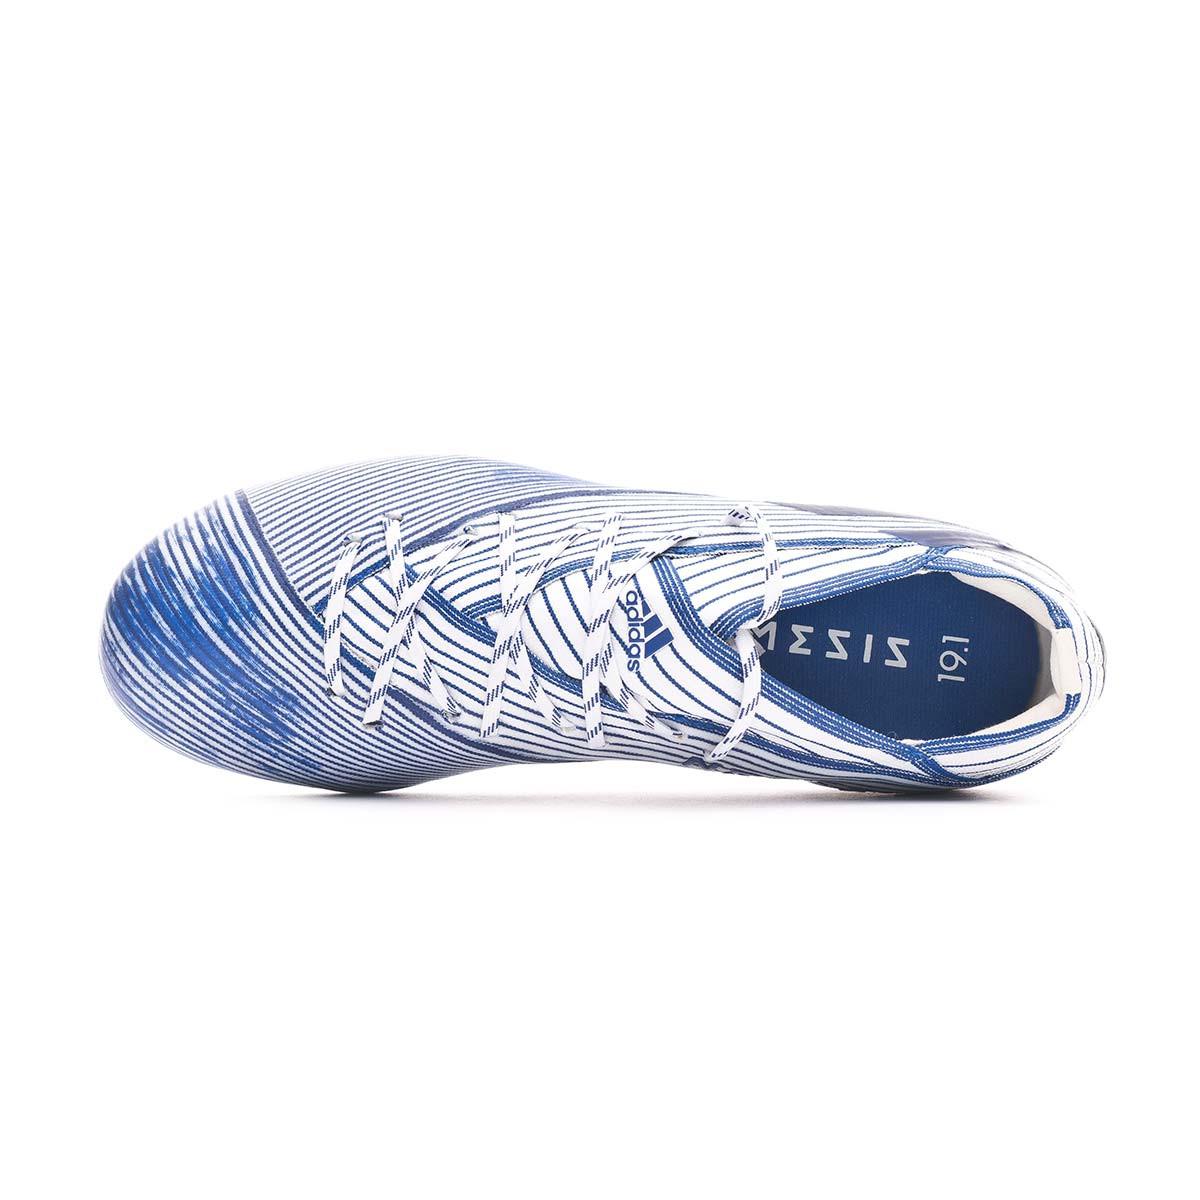 Scarpe adidas Nemeziz 19.1 FG Bambino White Team royal blue